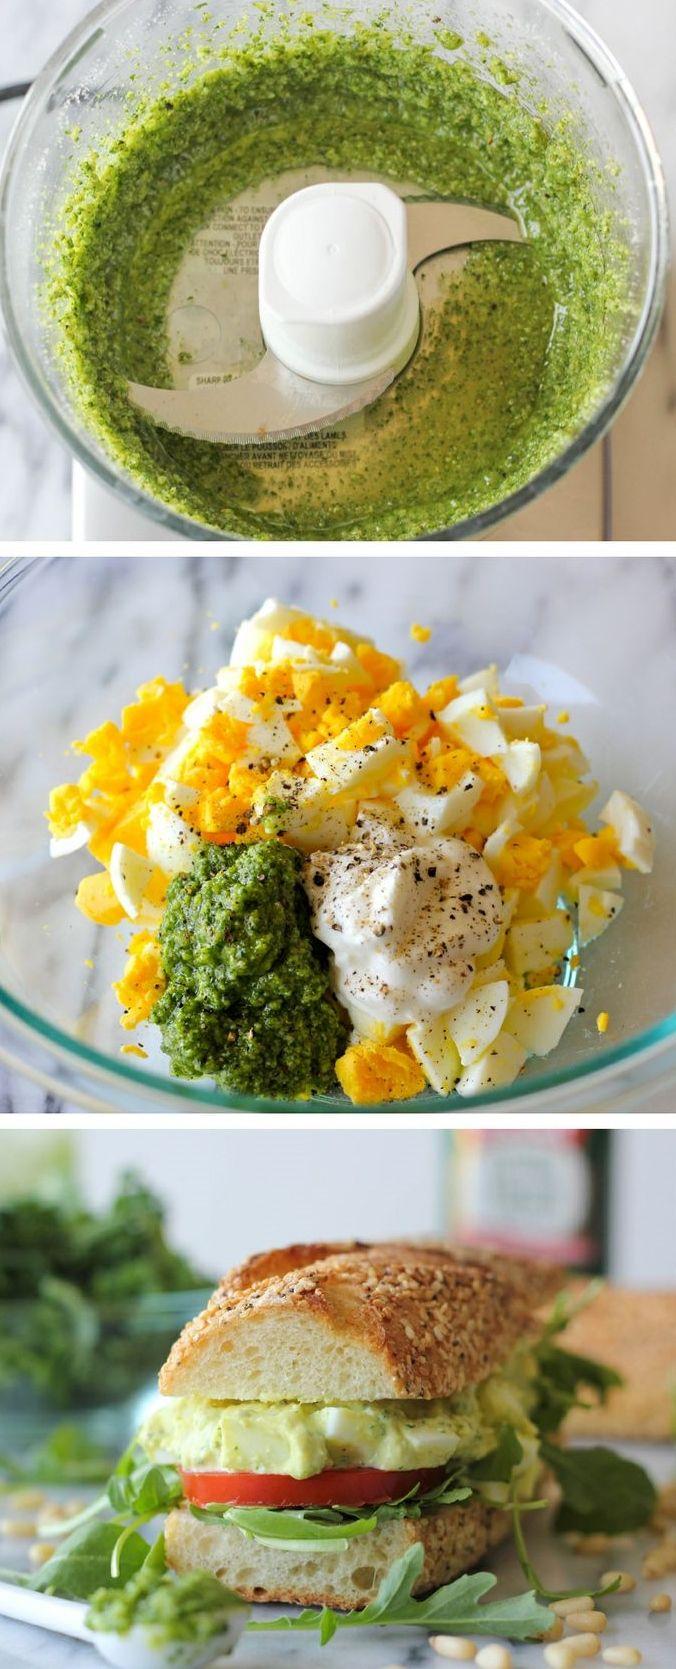 Egg Salad with Kale Pesto #fresh #healthy